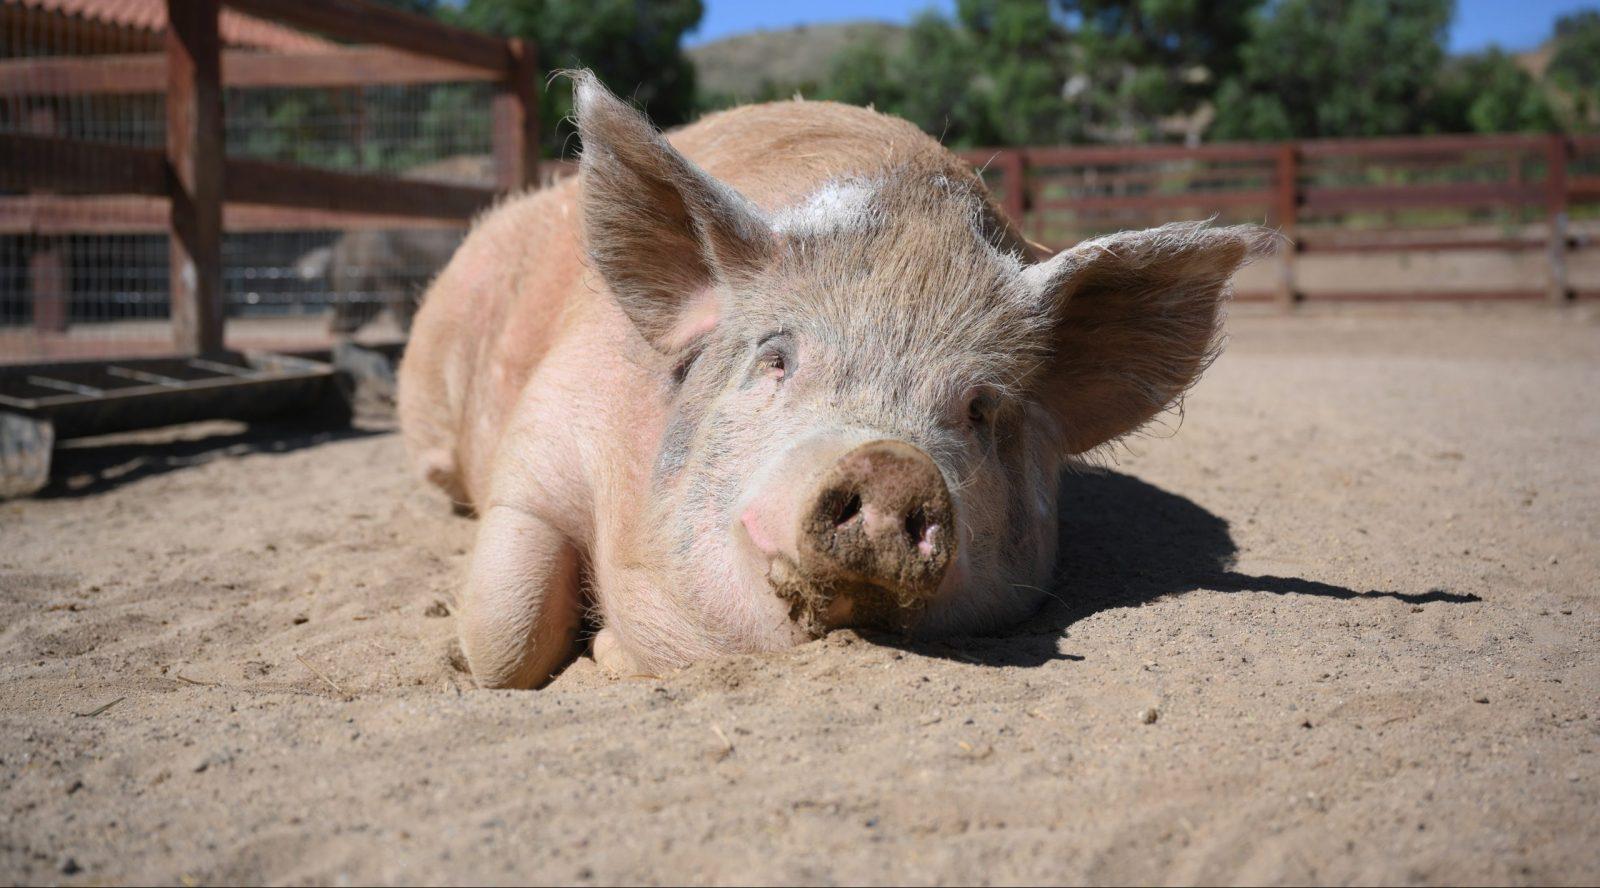 Von D Pig at Farm Sanctuary's Southern California shelter